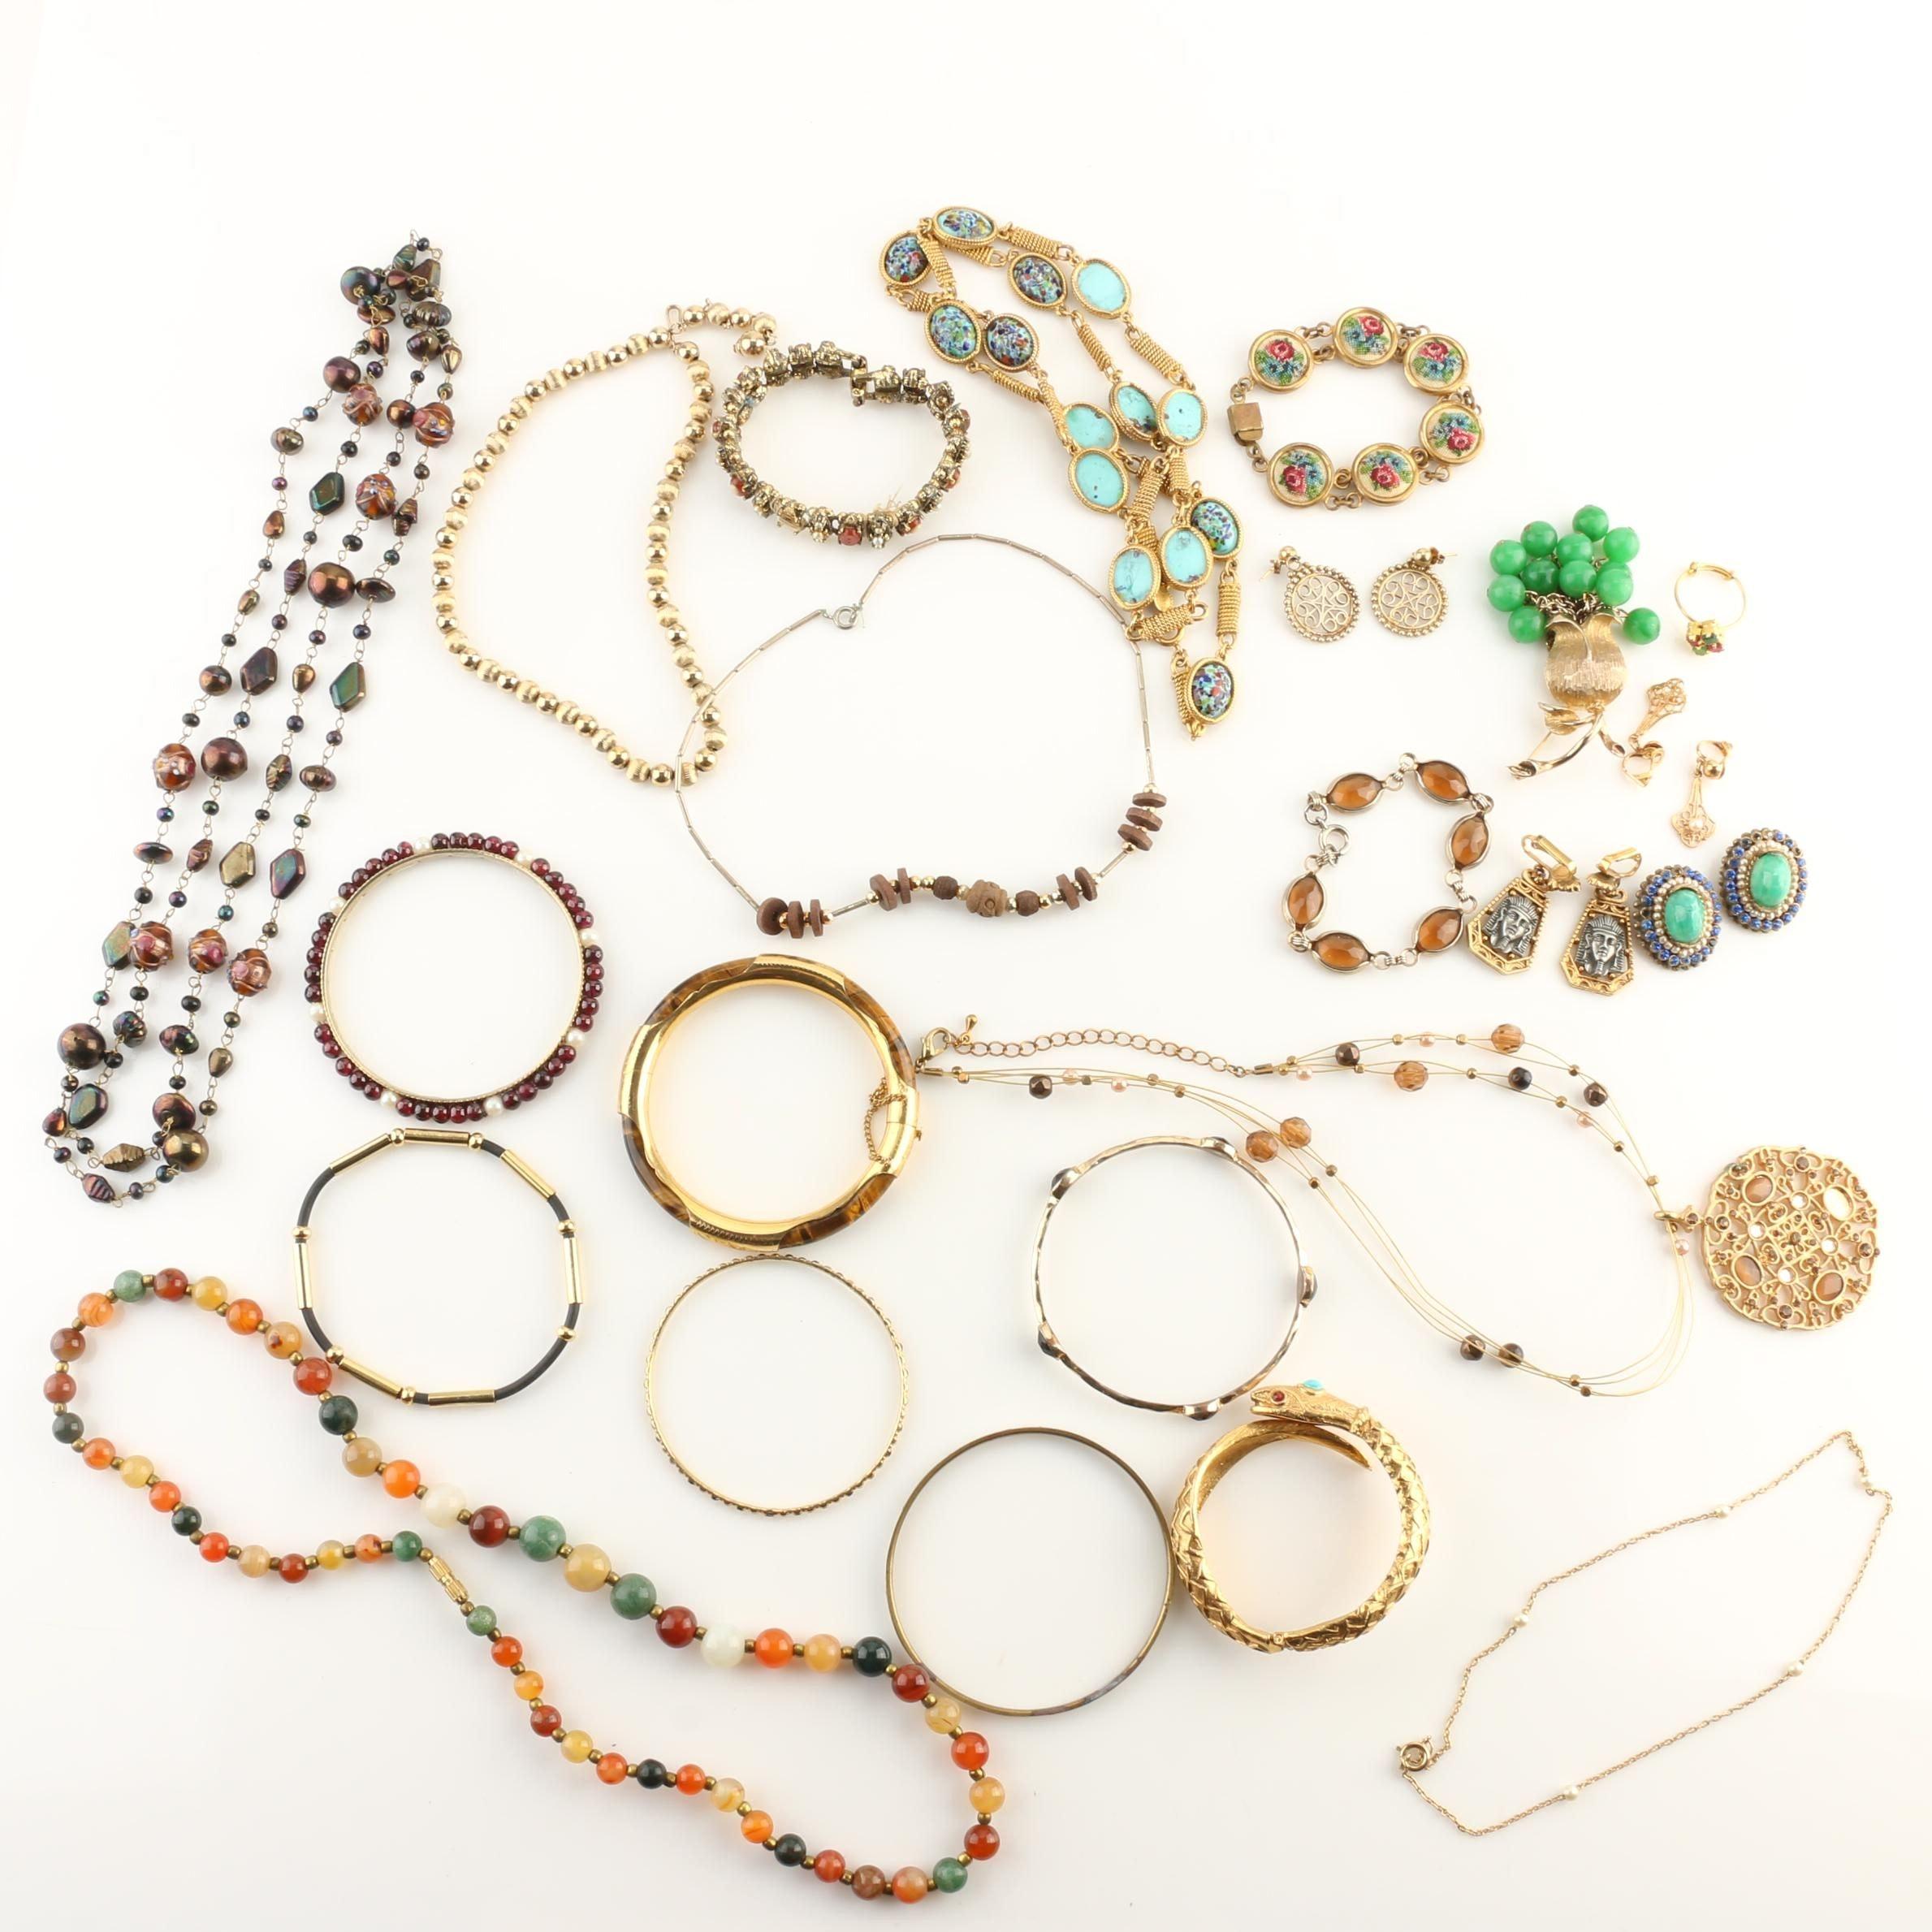 Gold-Tone Jewelry Assortment Including Agate, Jasper, Garnet, and Glass